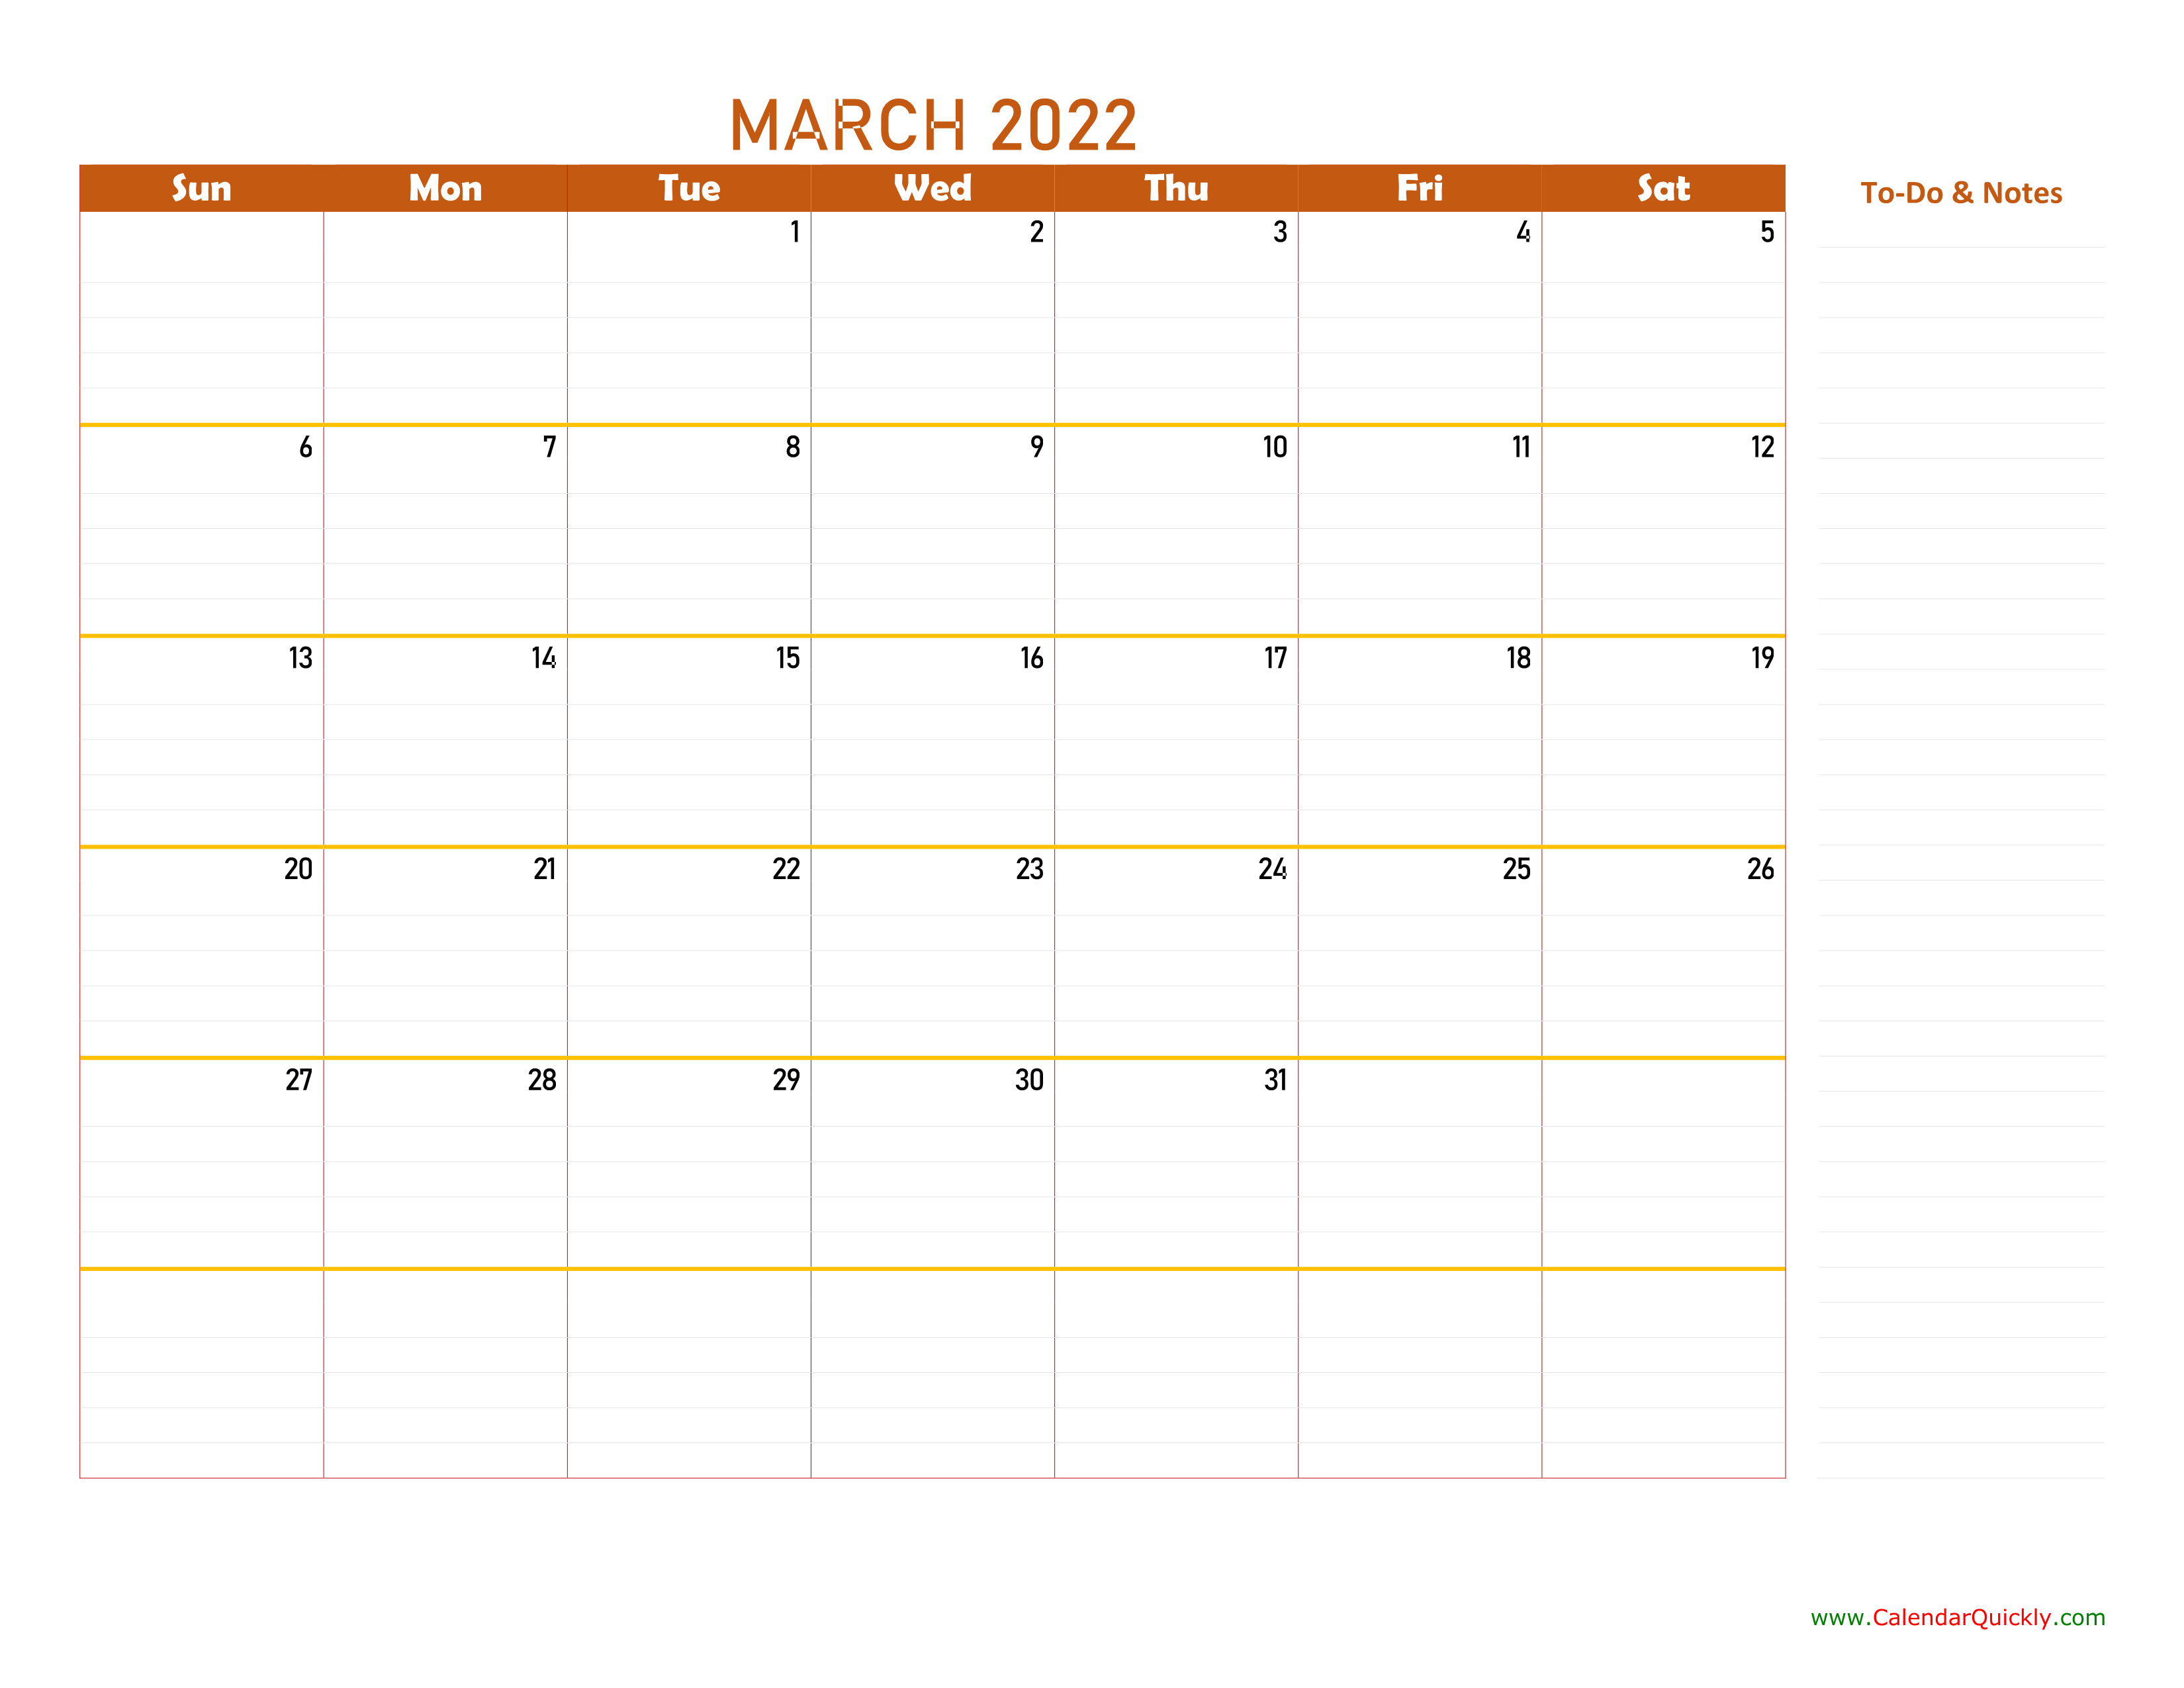 March 2022 Calendar | Calendar Quickly Throughout Calendar Of March 2022